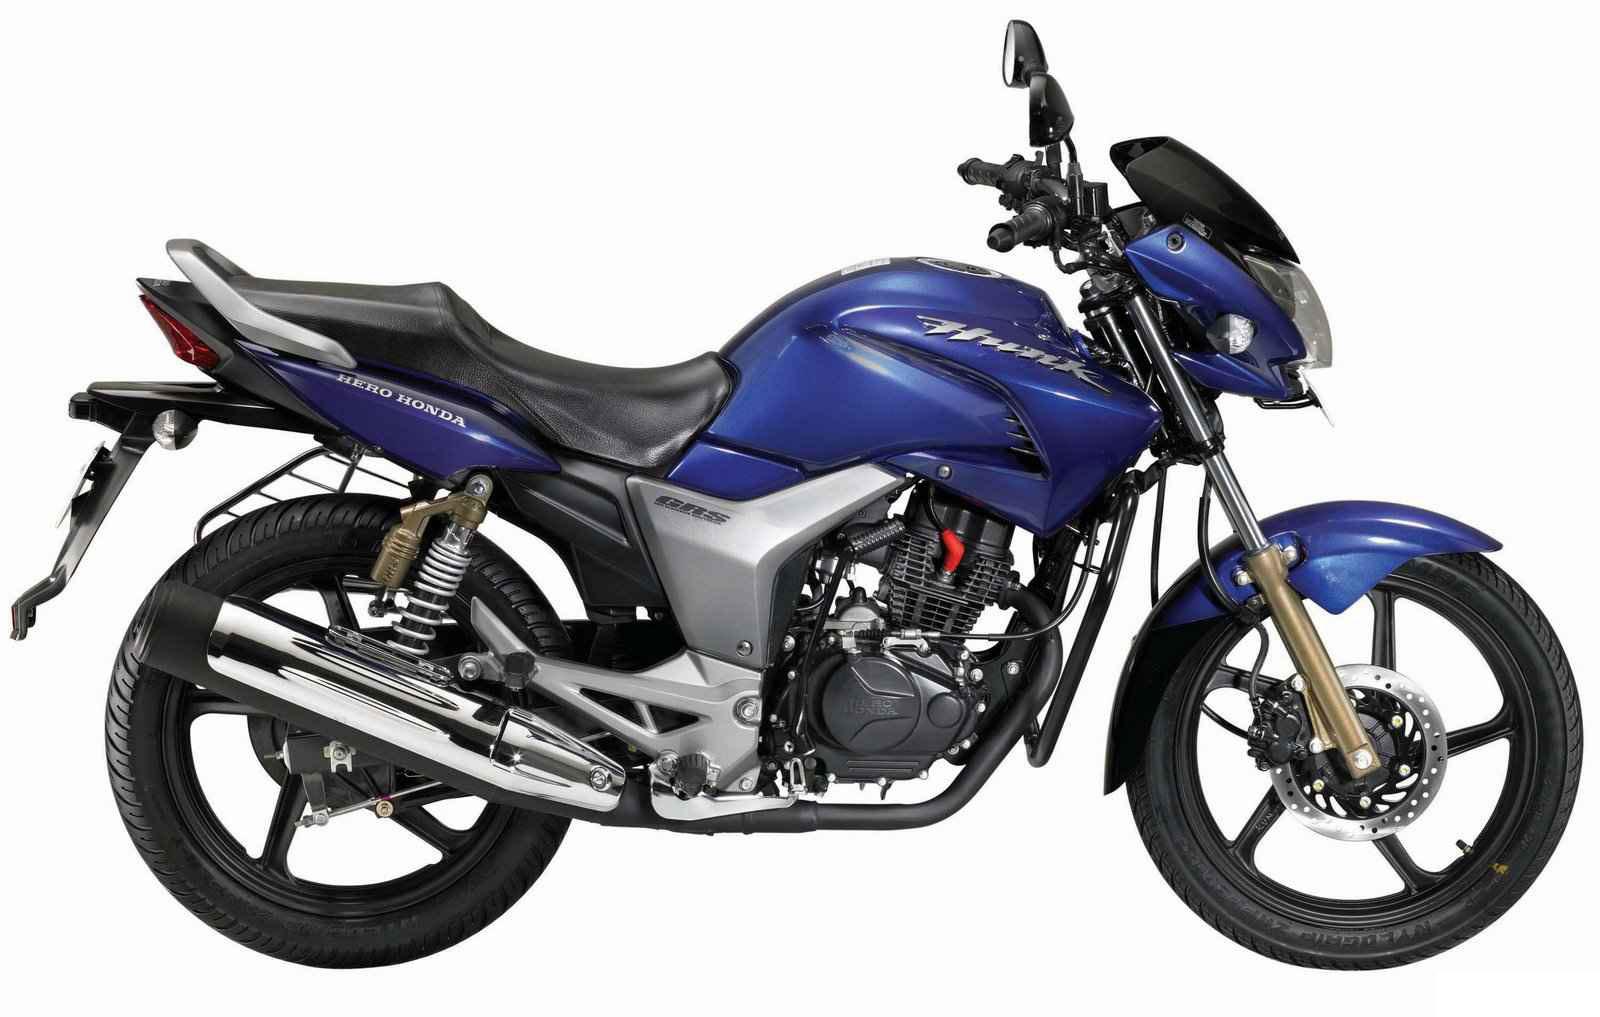 motorcycle and hero honda Hero bikes in india hero motocorp ltd (formerly hero honda motors ltd) is a motorcycle and scooter manufacturer company based in india hero honda.